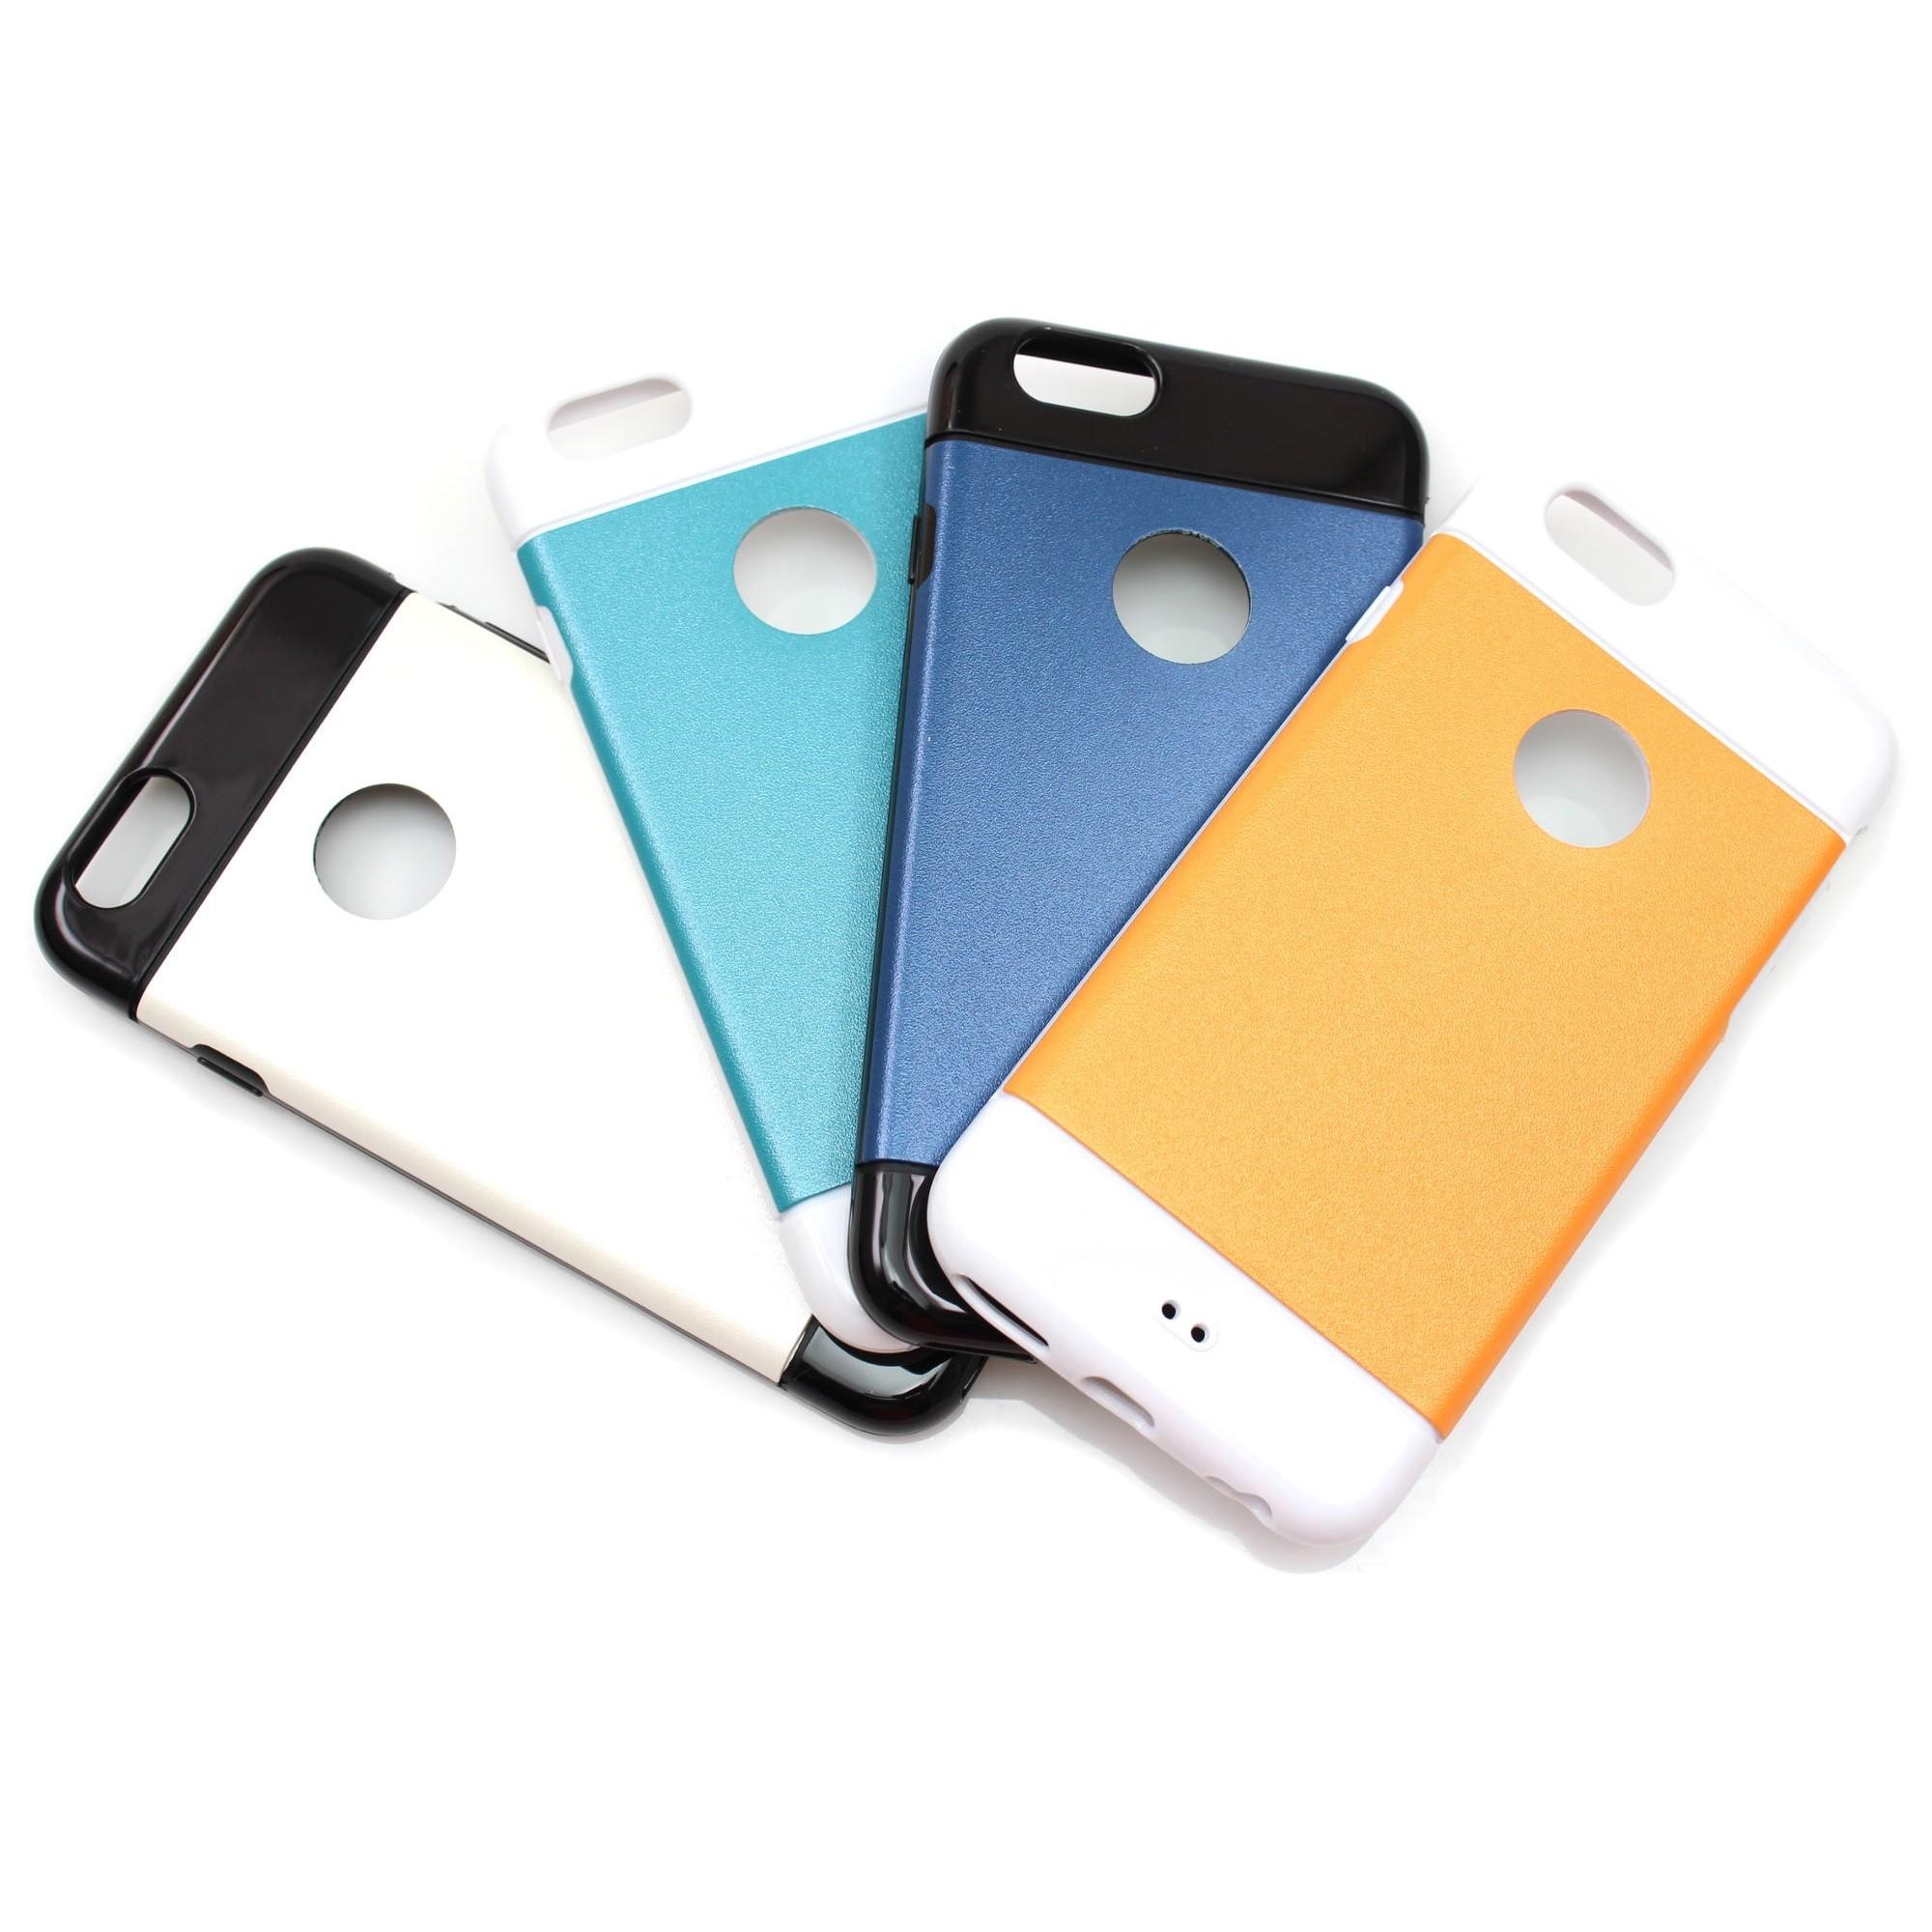 iPhone 6 Tvåfärgat skyddskal